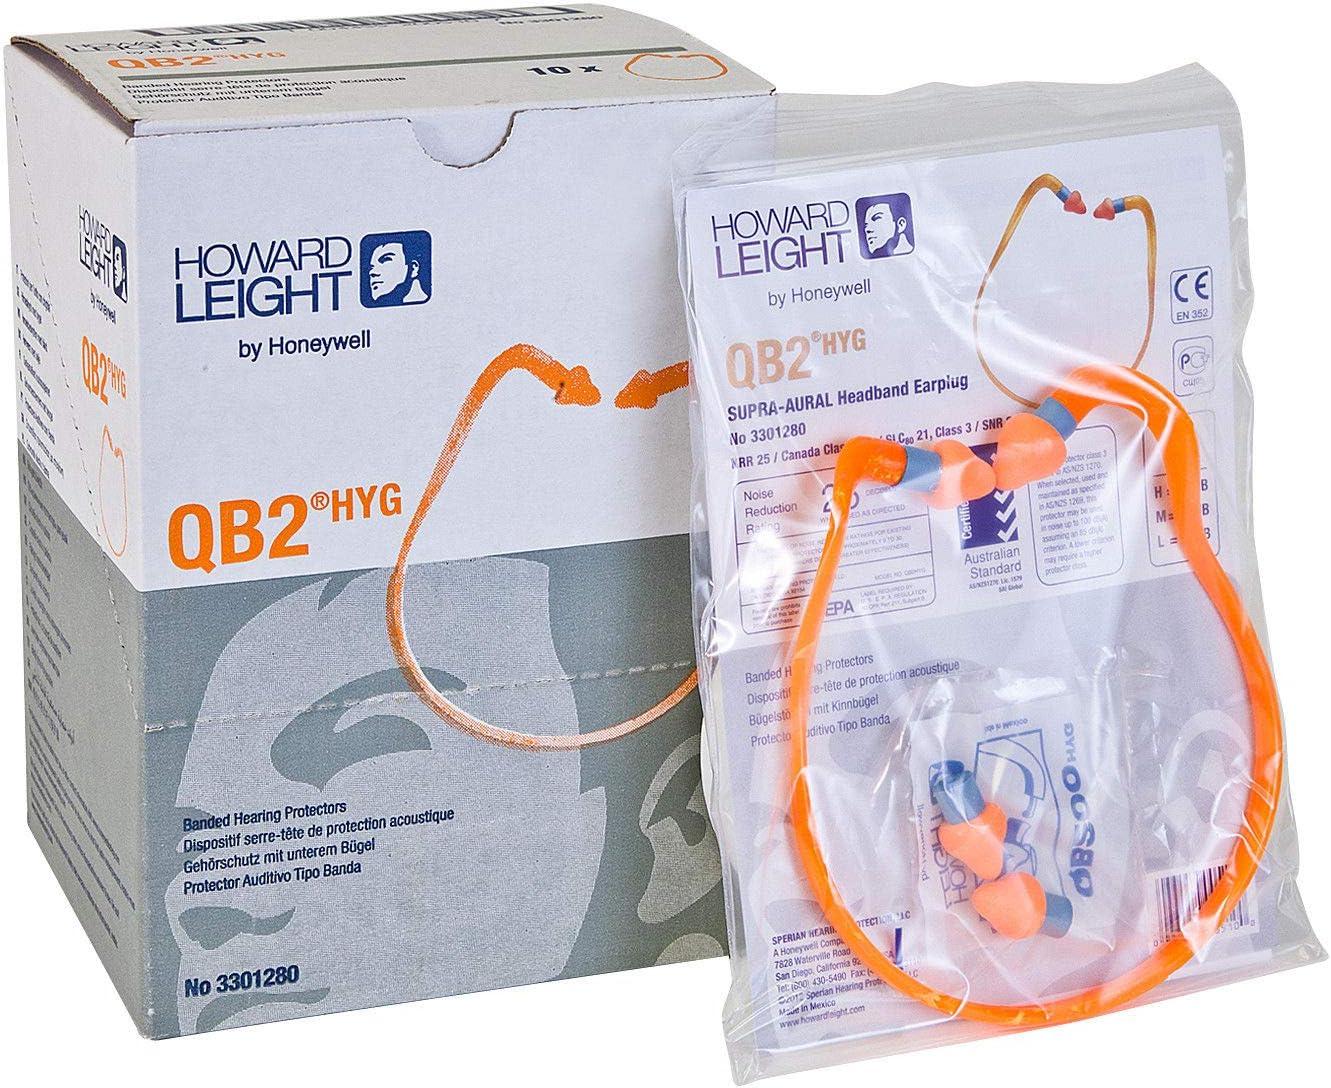 Howard Leight by Honeywell QB200HYG QB200HYG Replacement Multi-Use Plugs 25NRR Orange 50 Pairs